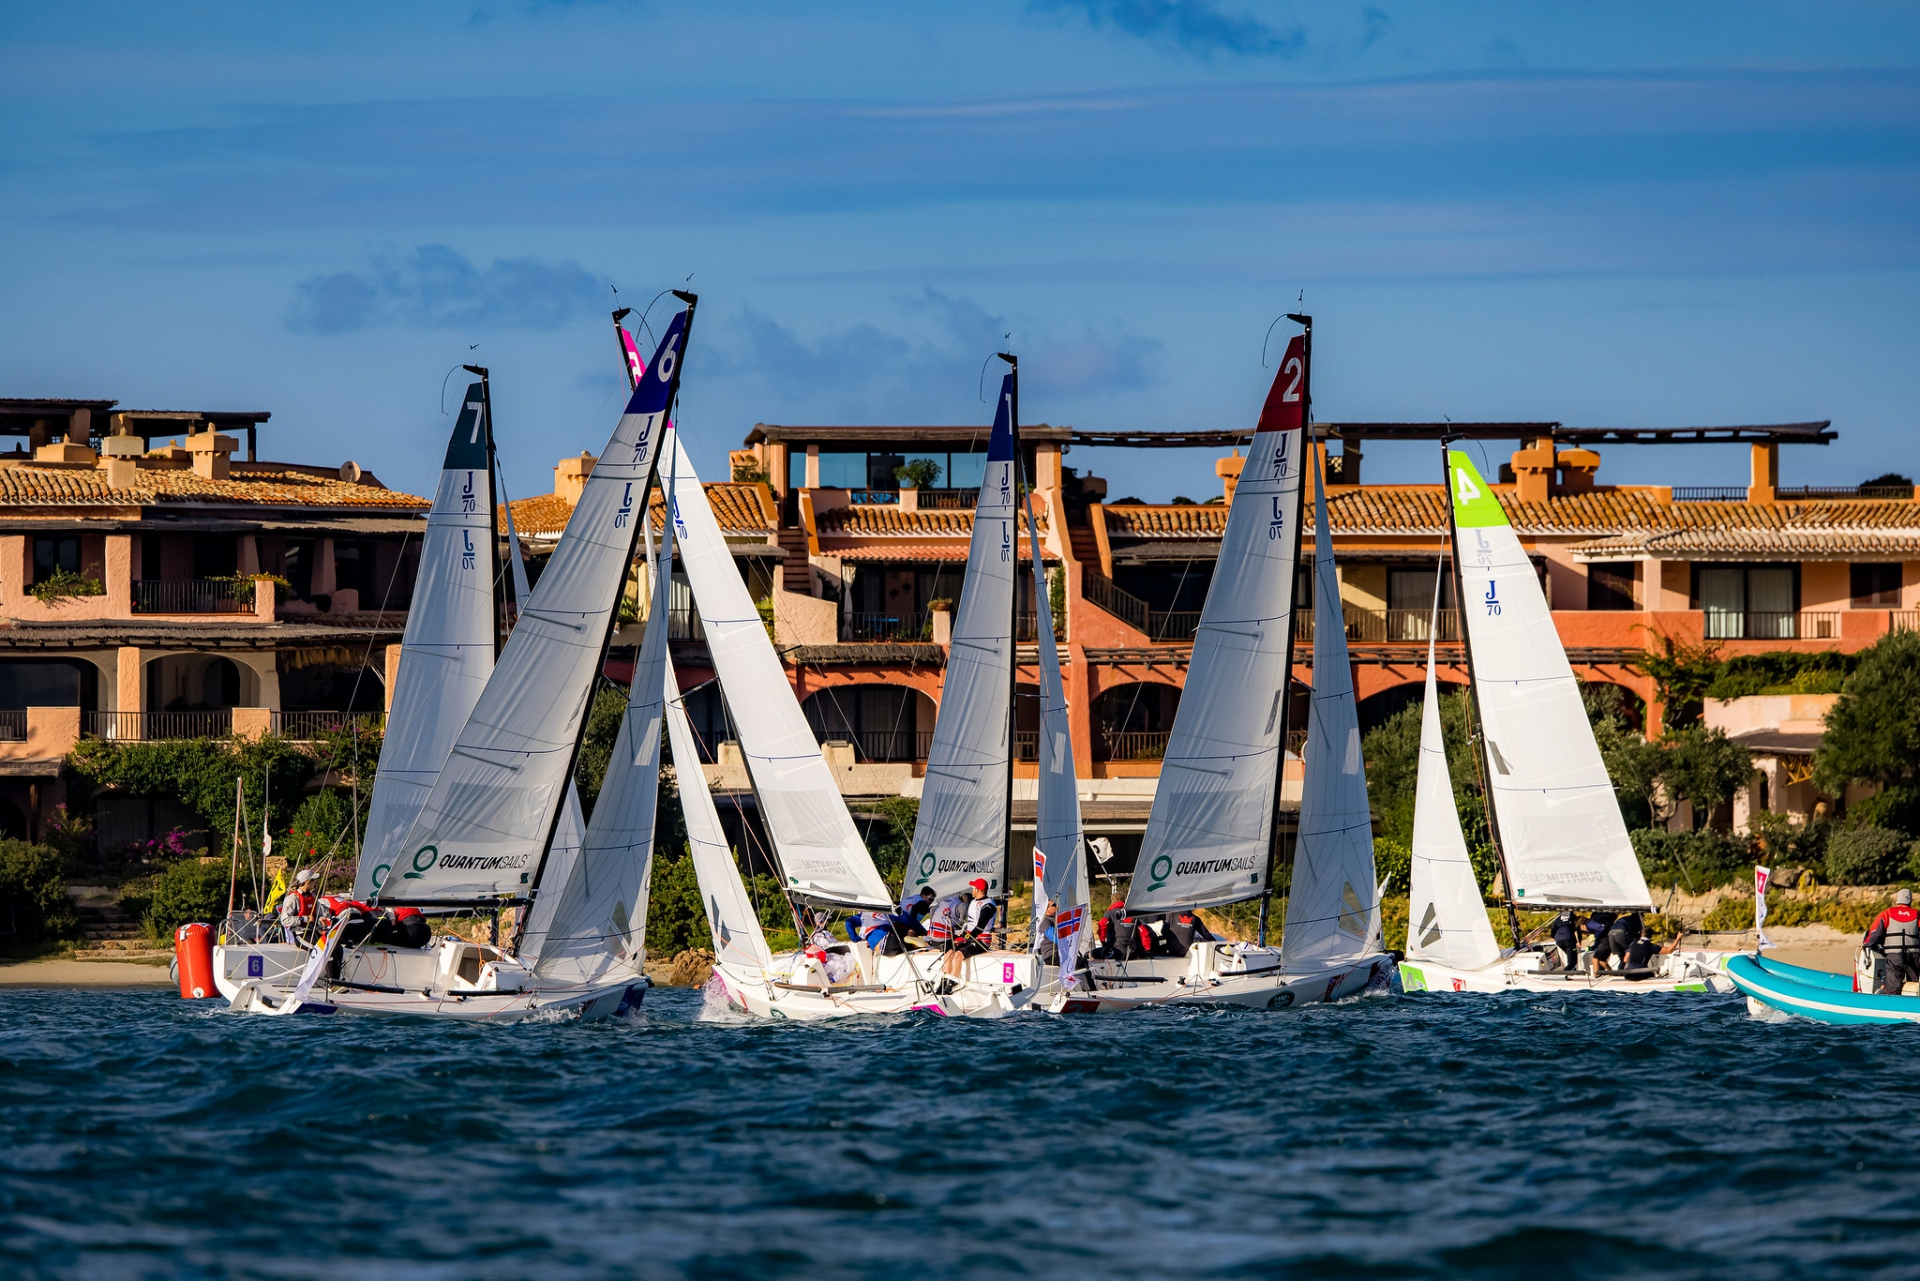 Il team finlandese Esbo Segelförening vince la SAILING Champions League Final - NEWS - Yacht Club Costa Smeralda